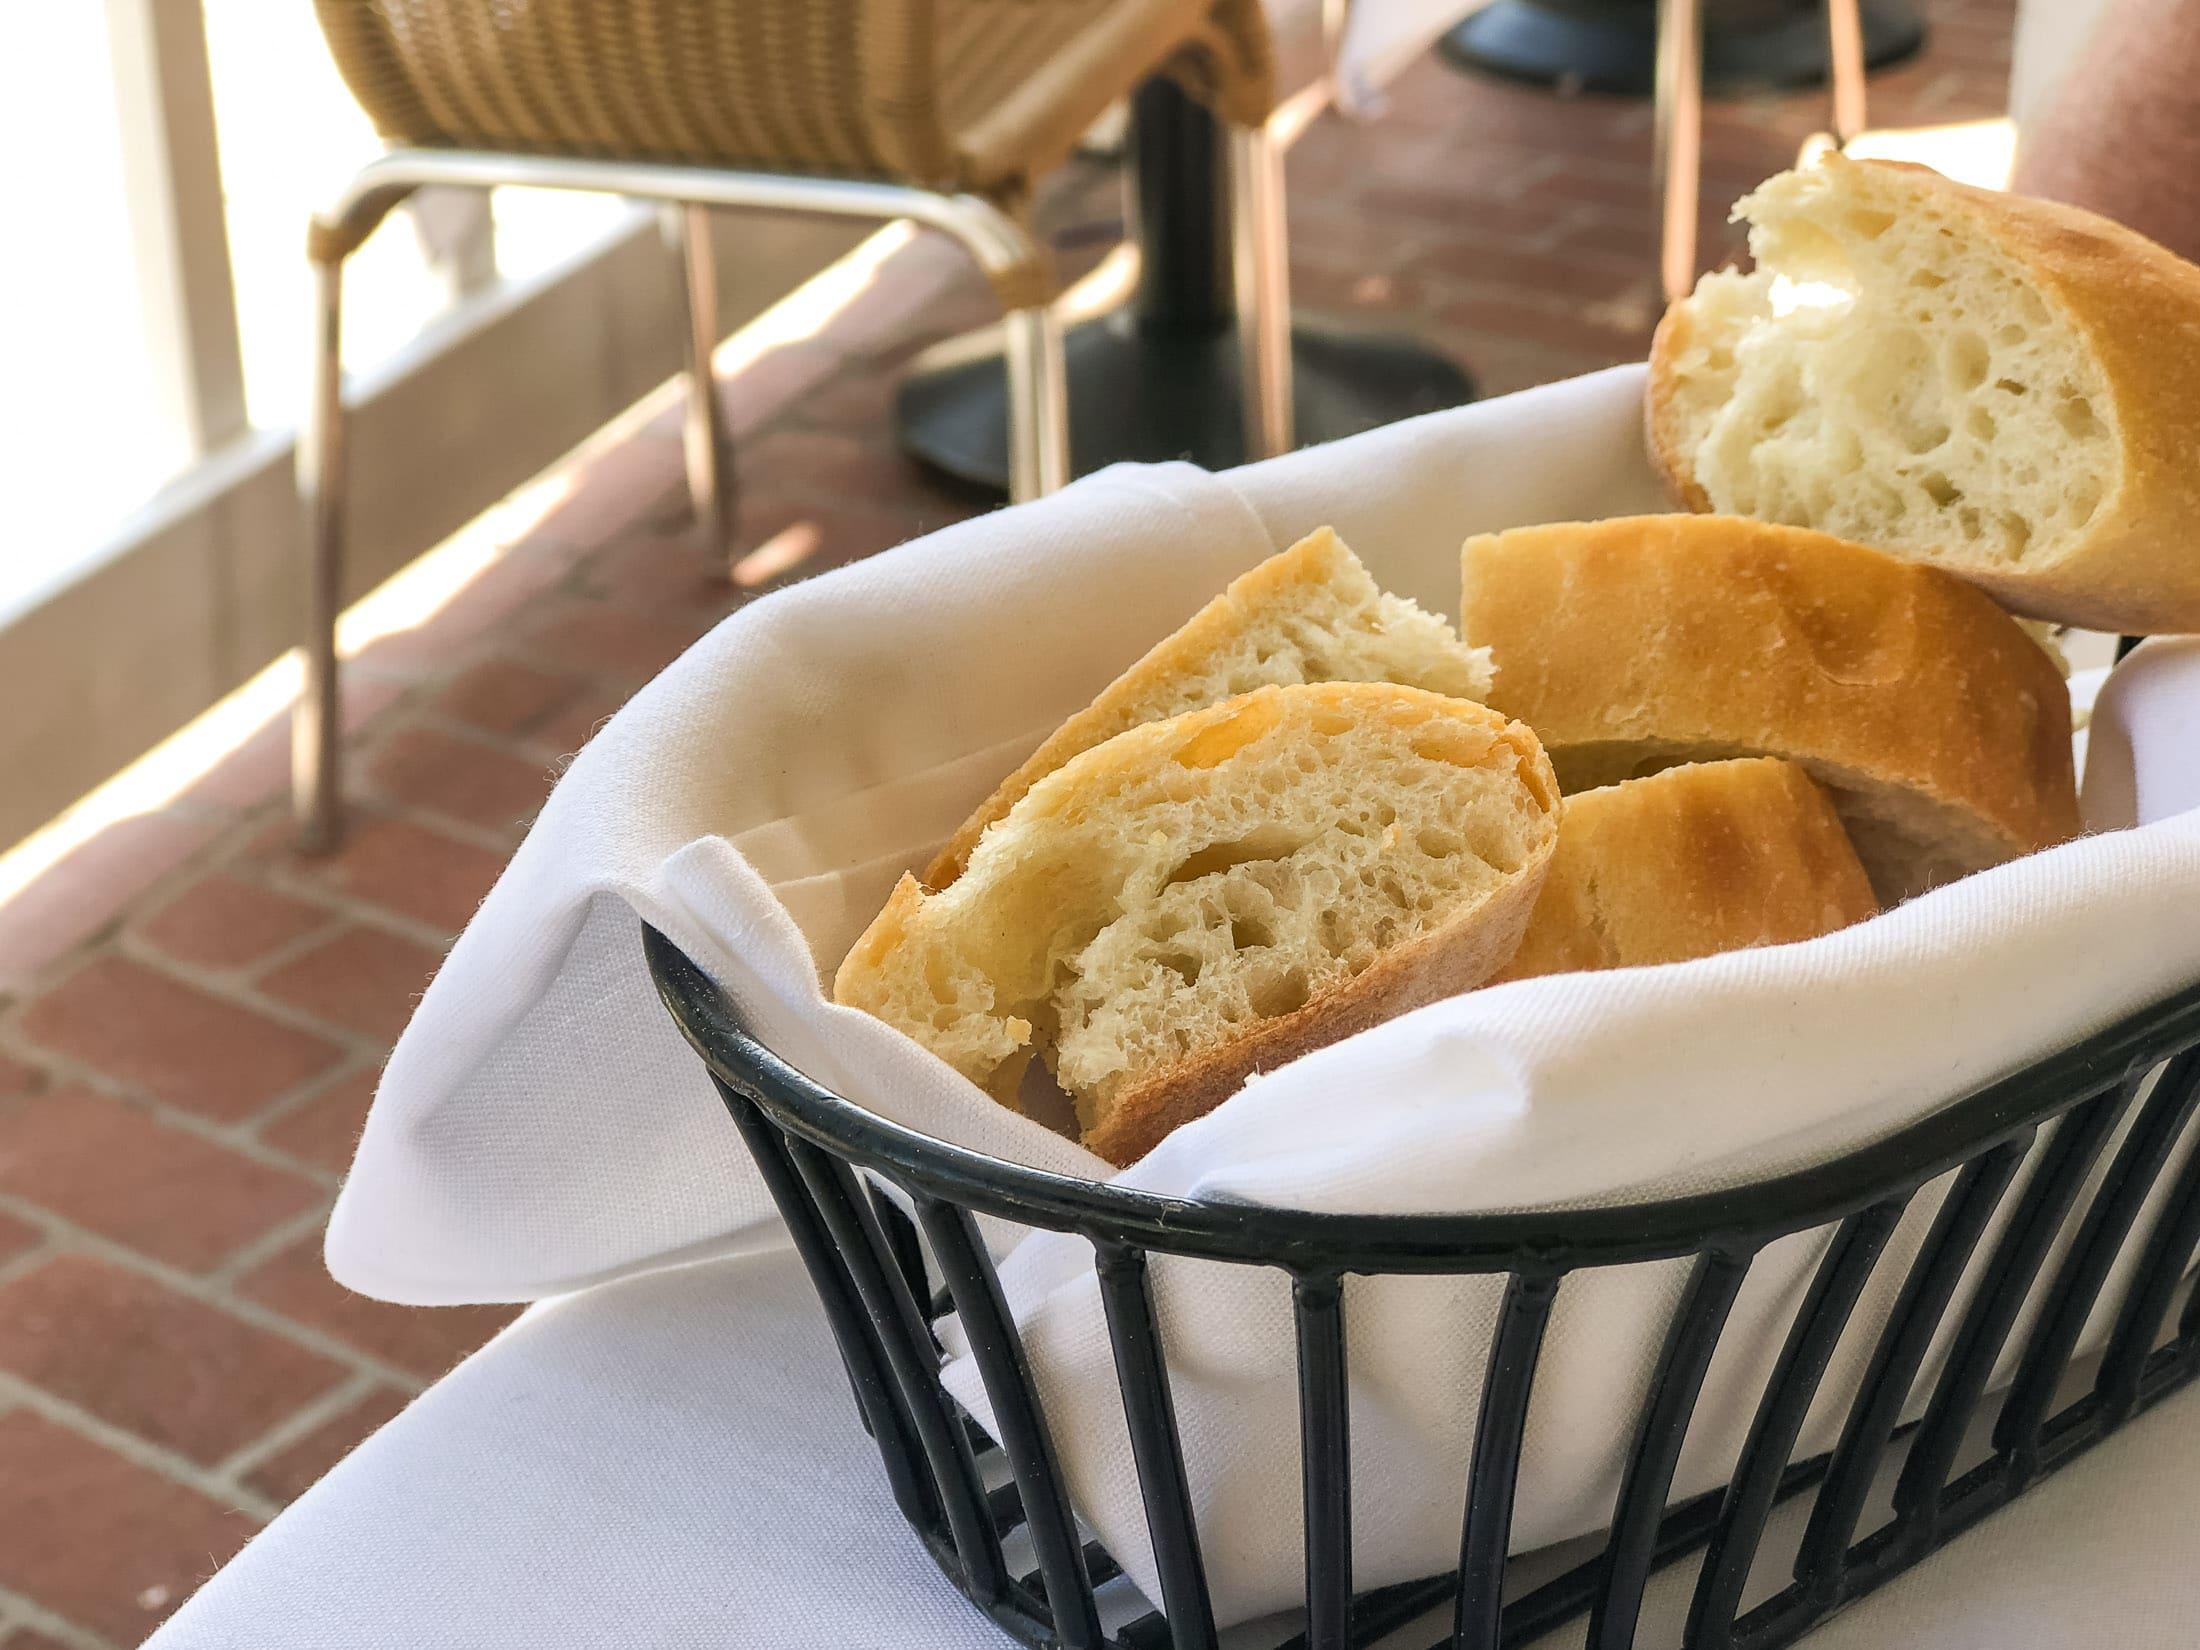 Piatti La Jolla bread basket